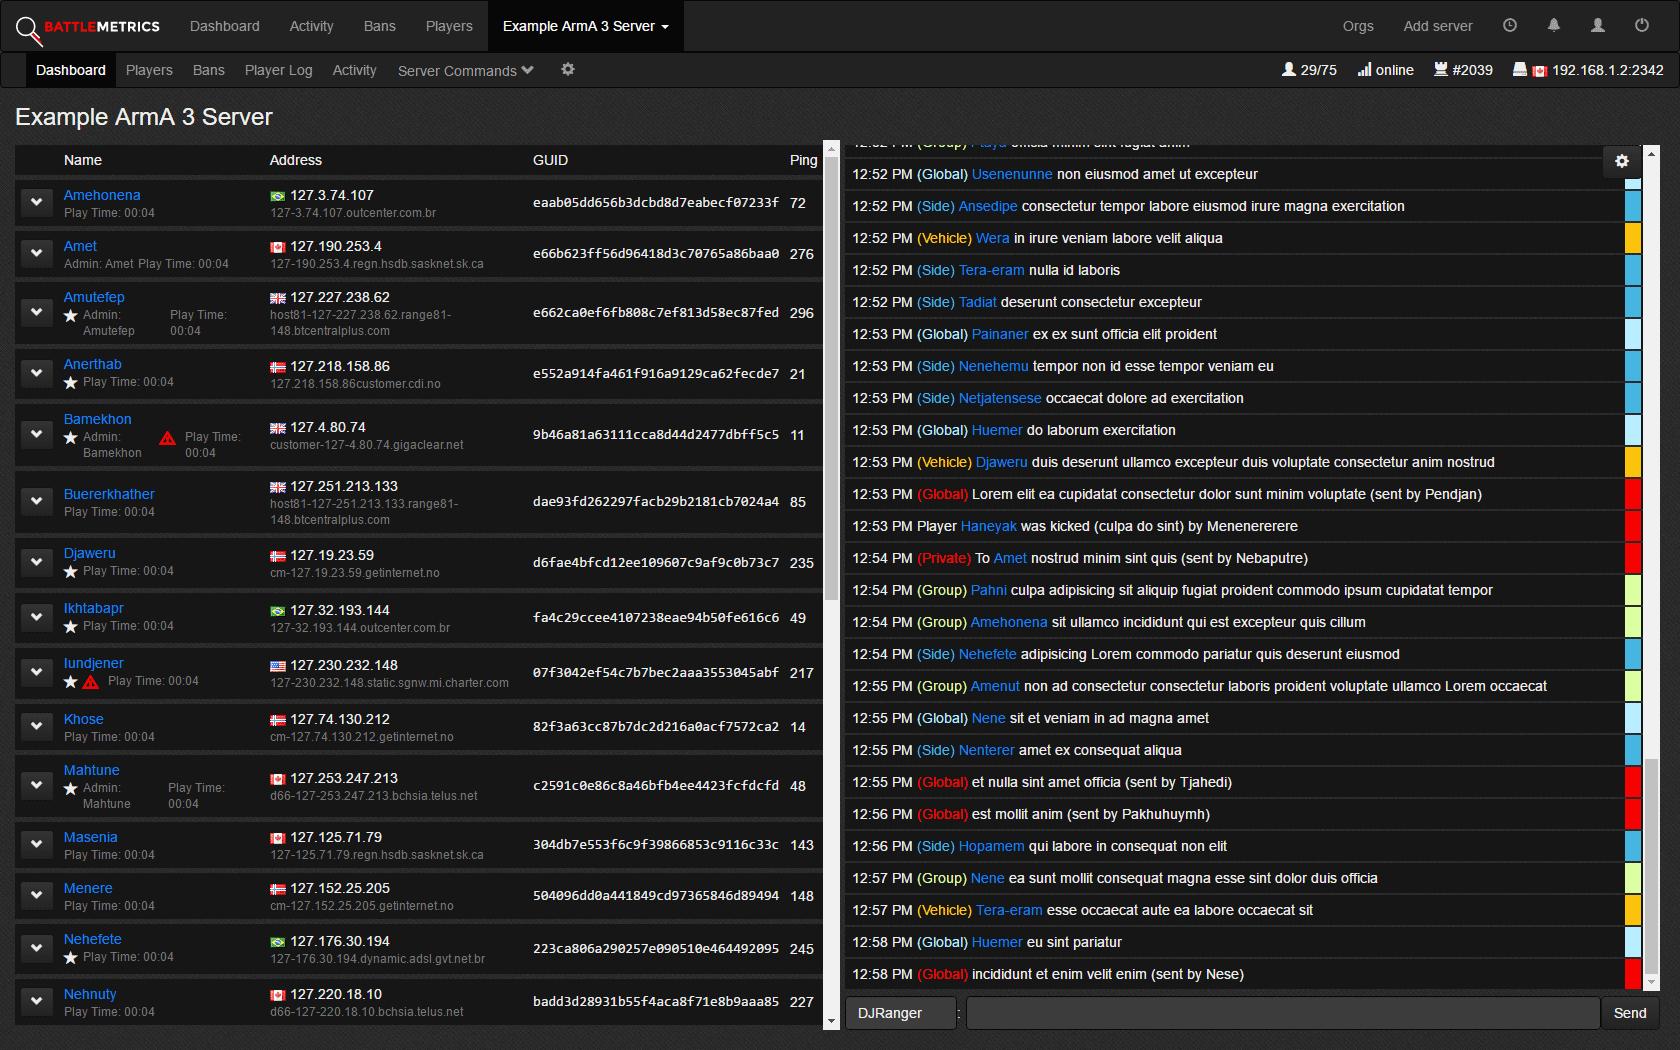 Detailed ArmA server information